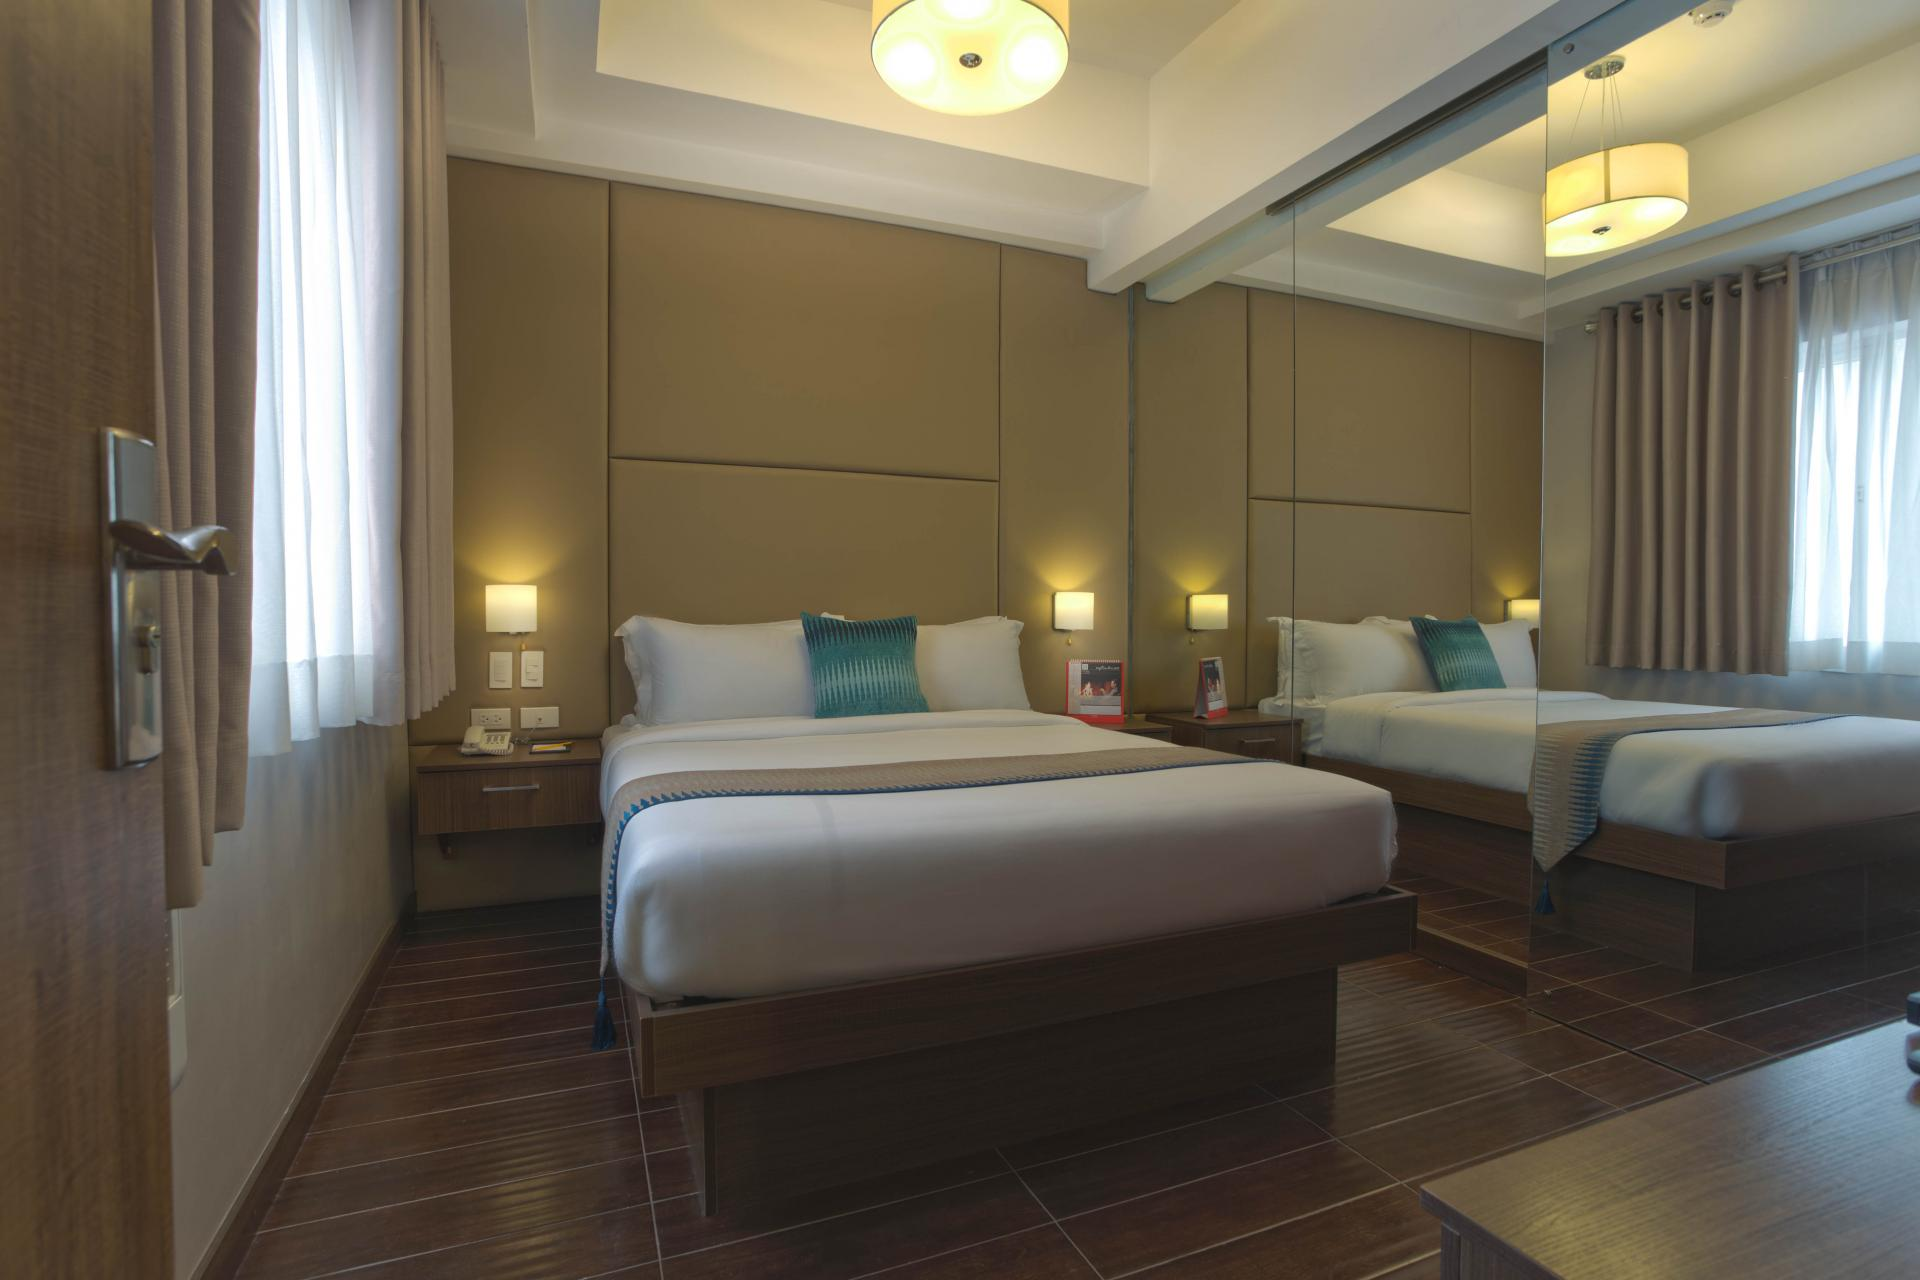 Bedroom at Valero Grand Suites